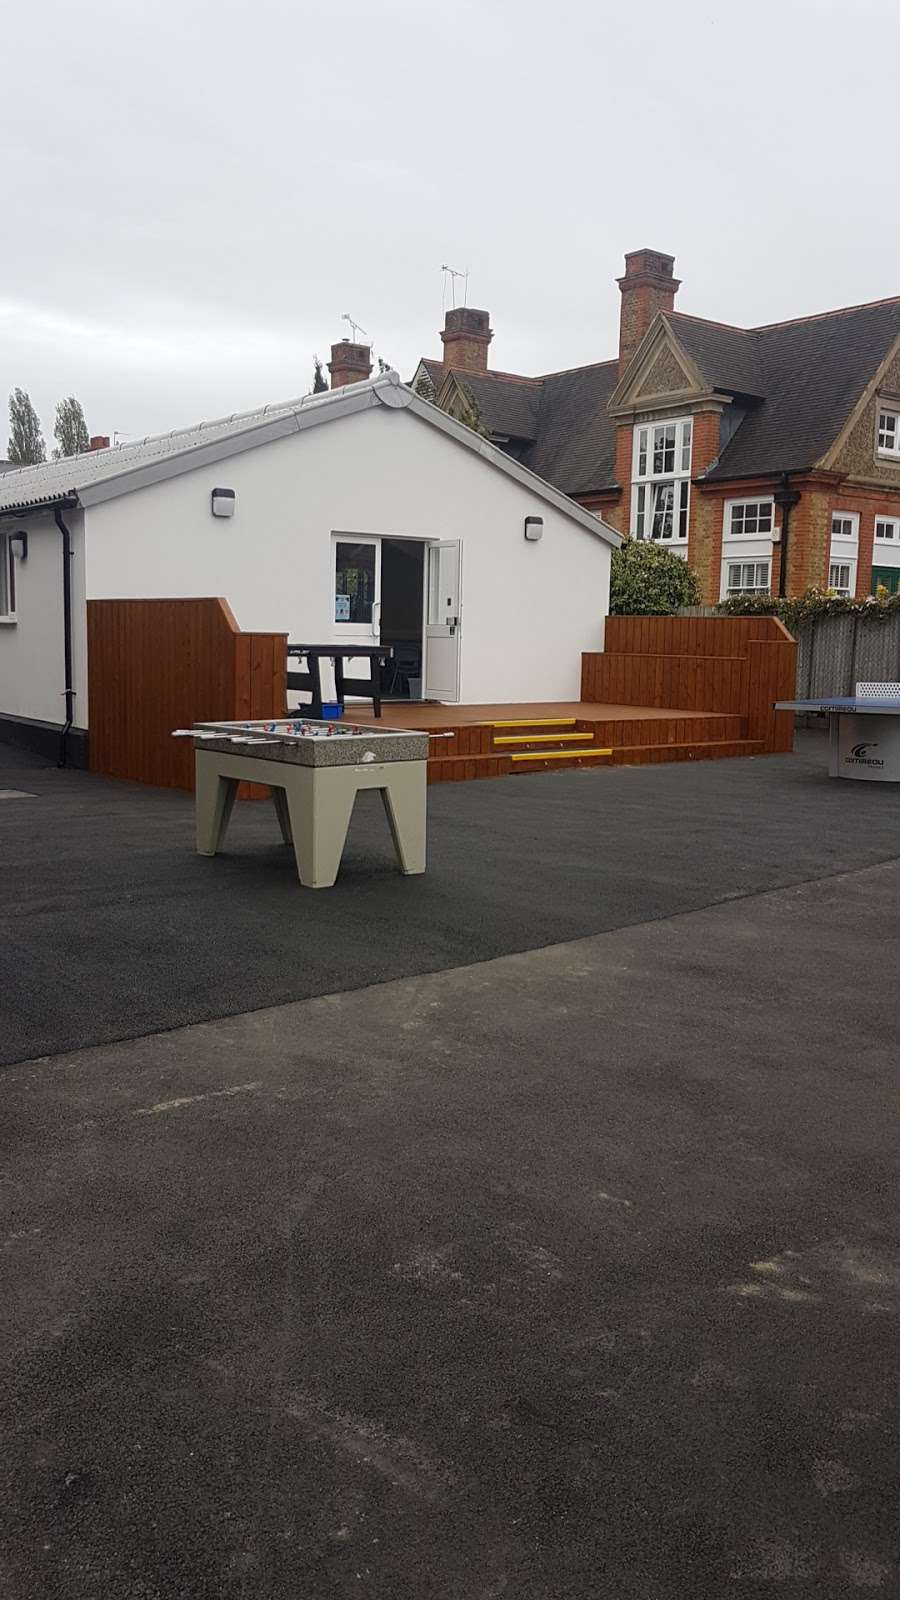 Telferscot Primary School - school  | Photo 8 of 10 | Address: Telferscot Rd, London SW12 0HW, UK | Phone: 020 8673 7362